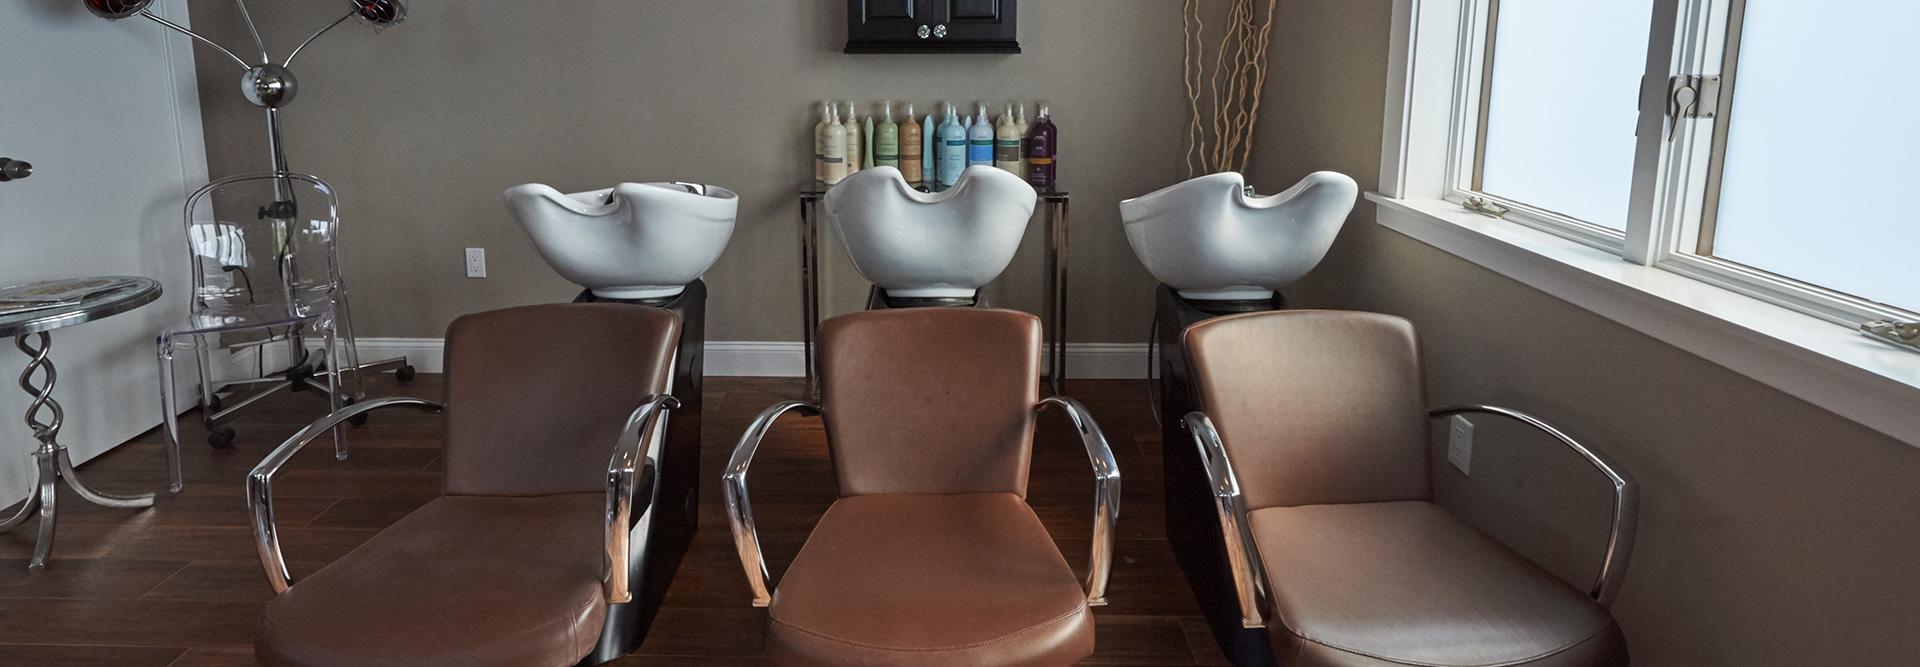 salon22 hair washing stations